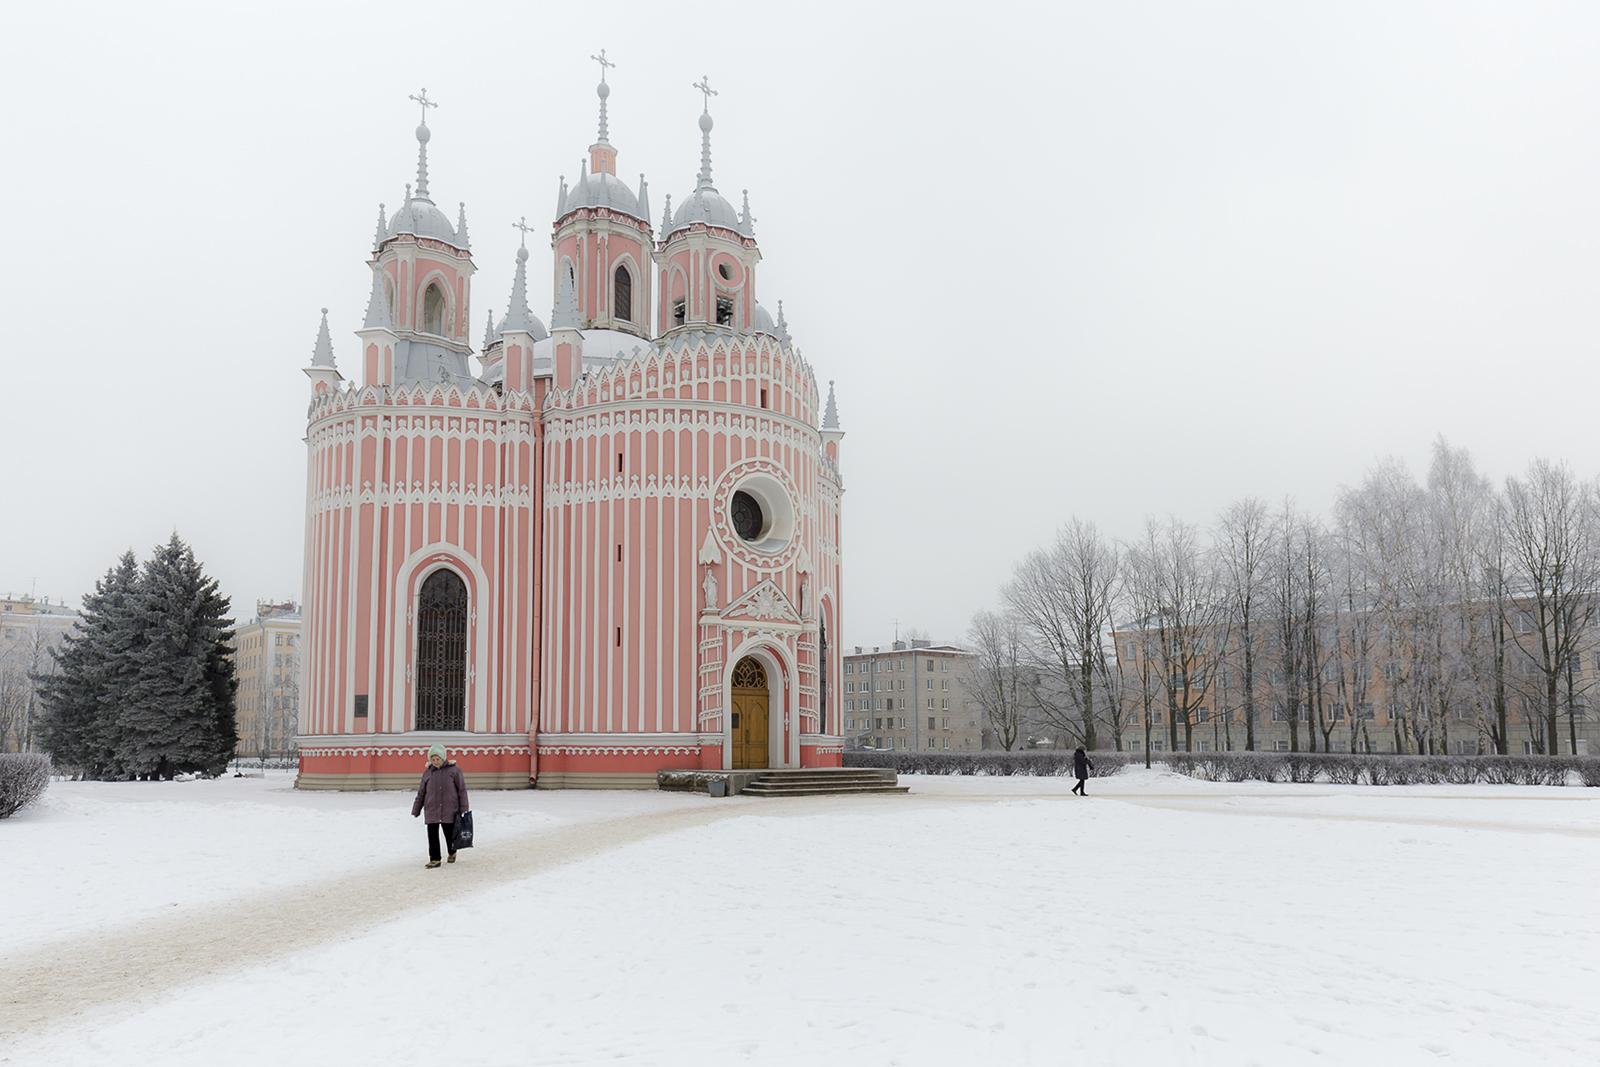 Wallpaper City Building Sky Snow Winter Ice Russia